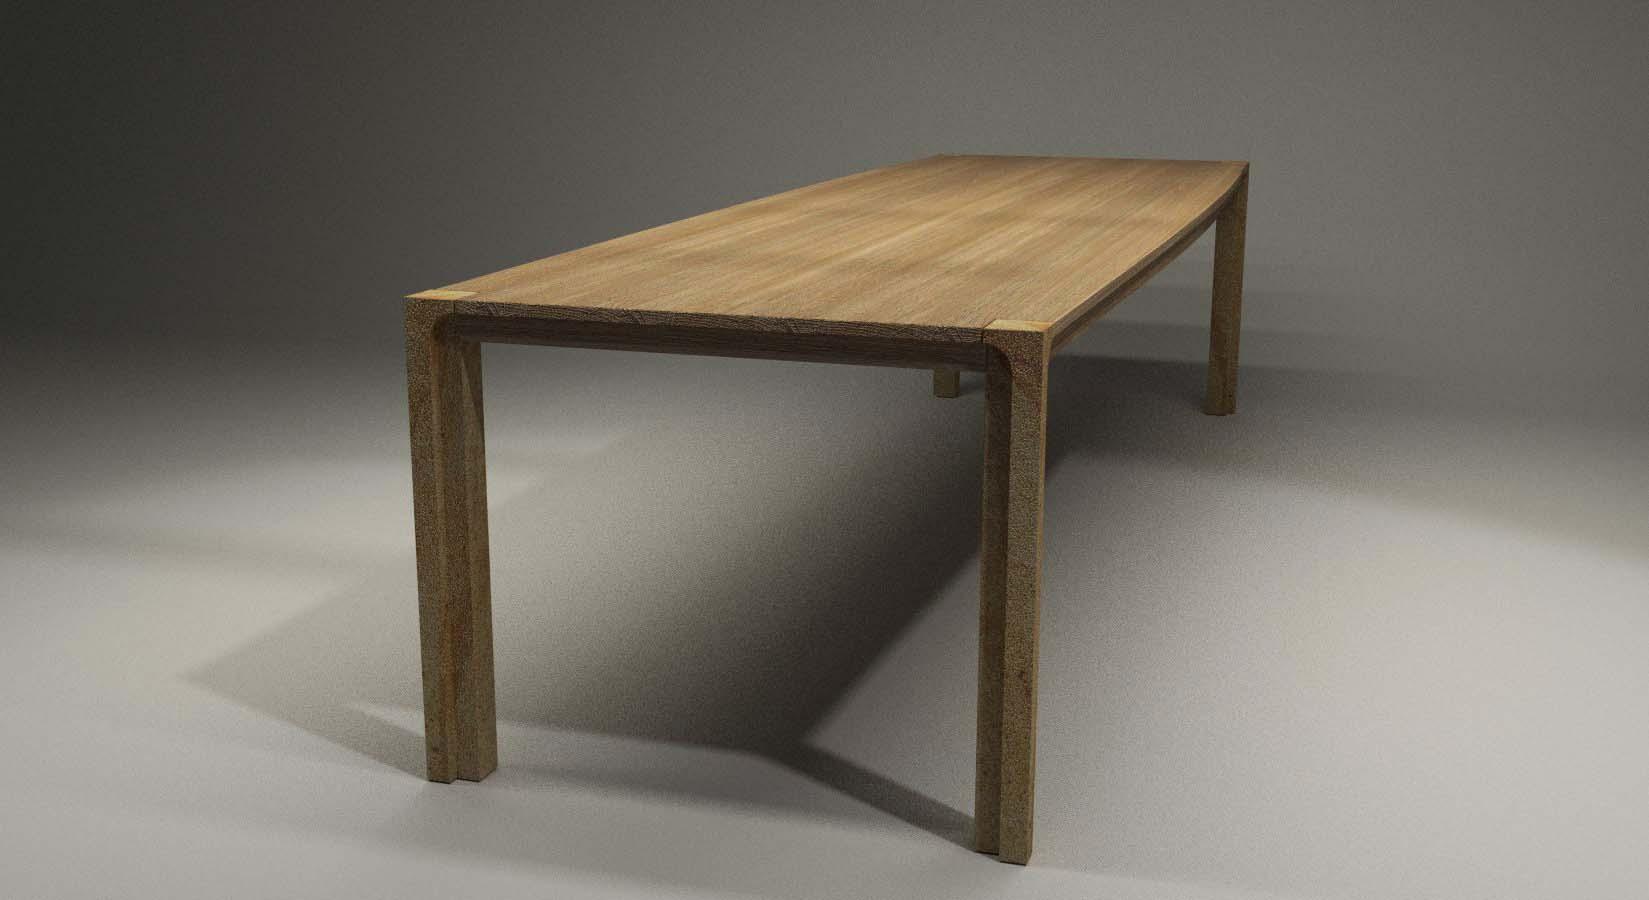 Design Tisch Cosel Nummer 1 aus Holz Sandstein by Sebastian Bohry timeless design